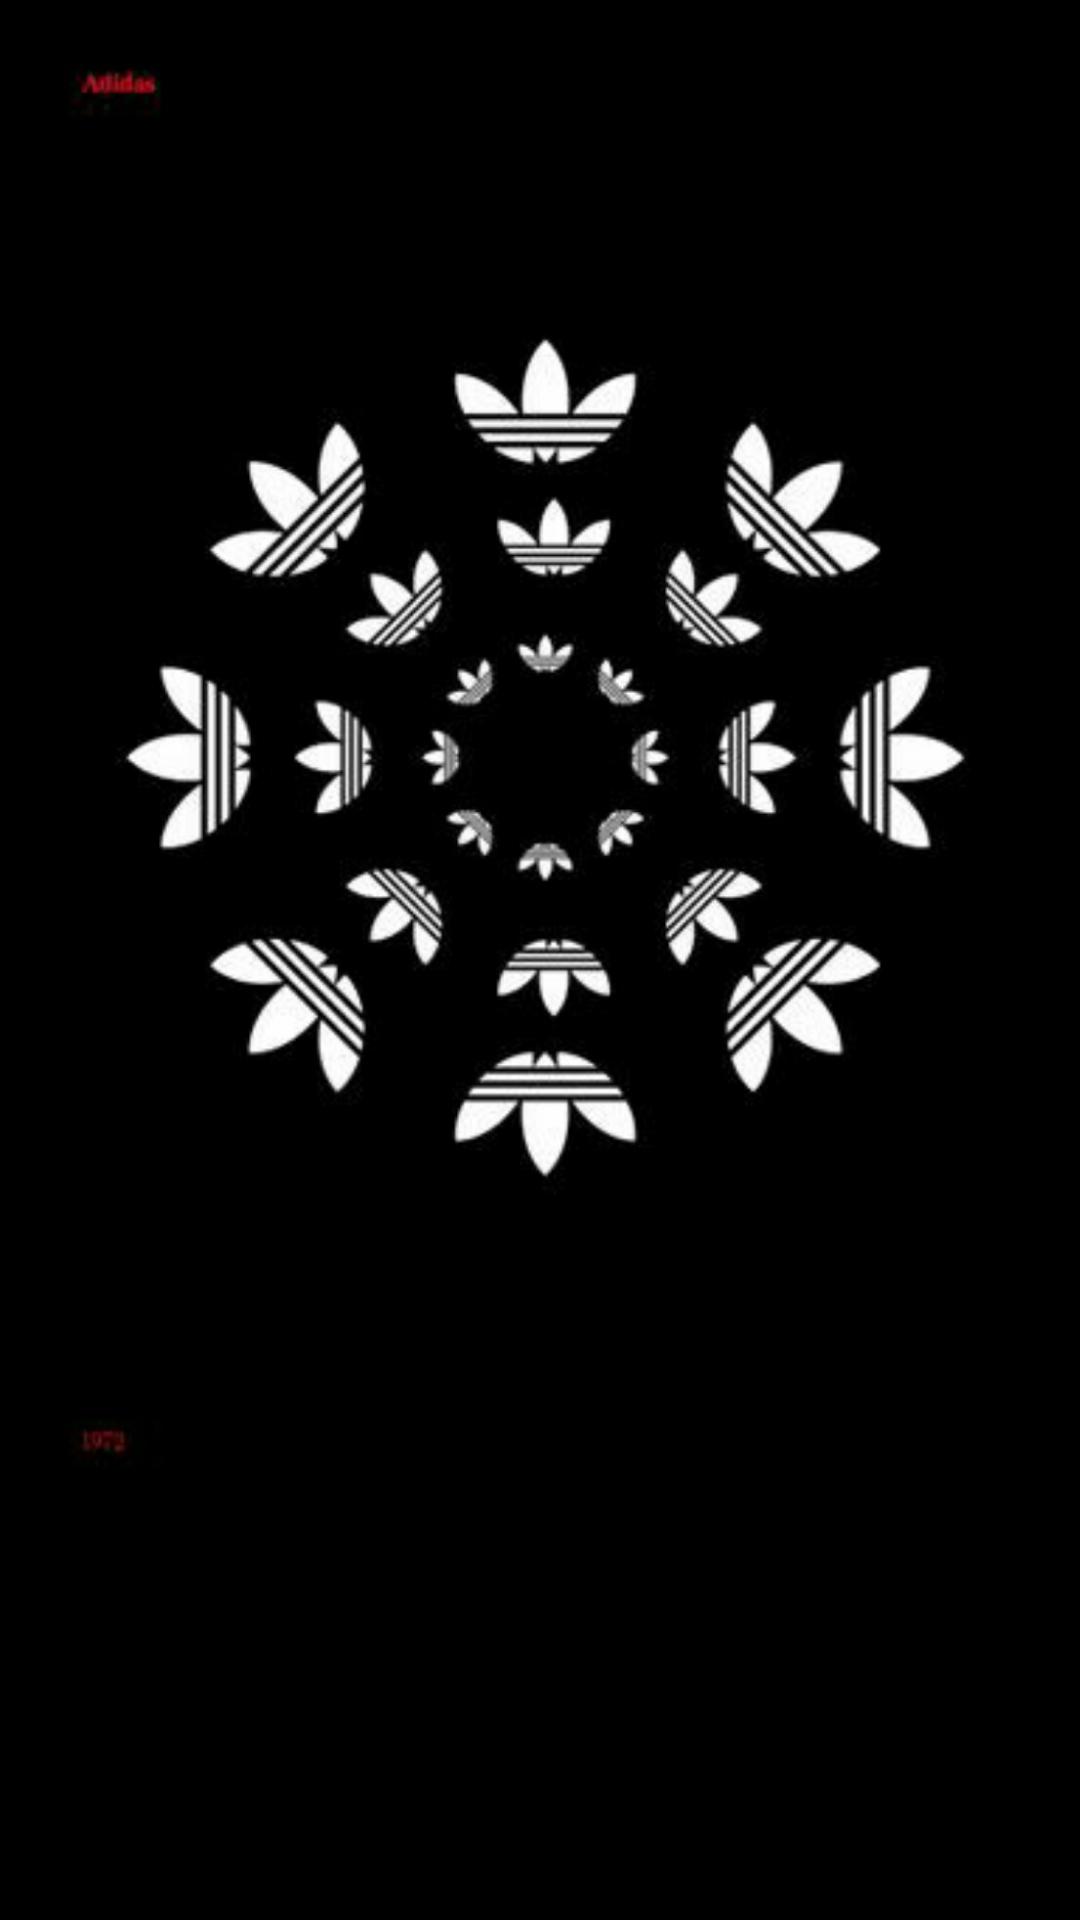 Free Download Adidas Originals Wallpaper 59 Images